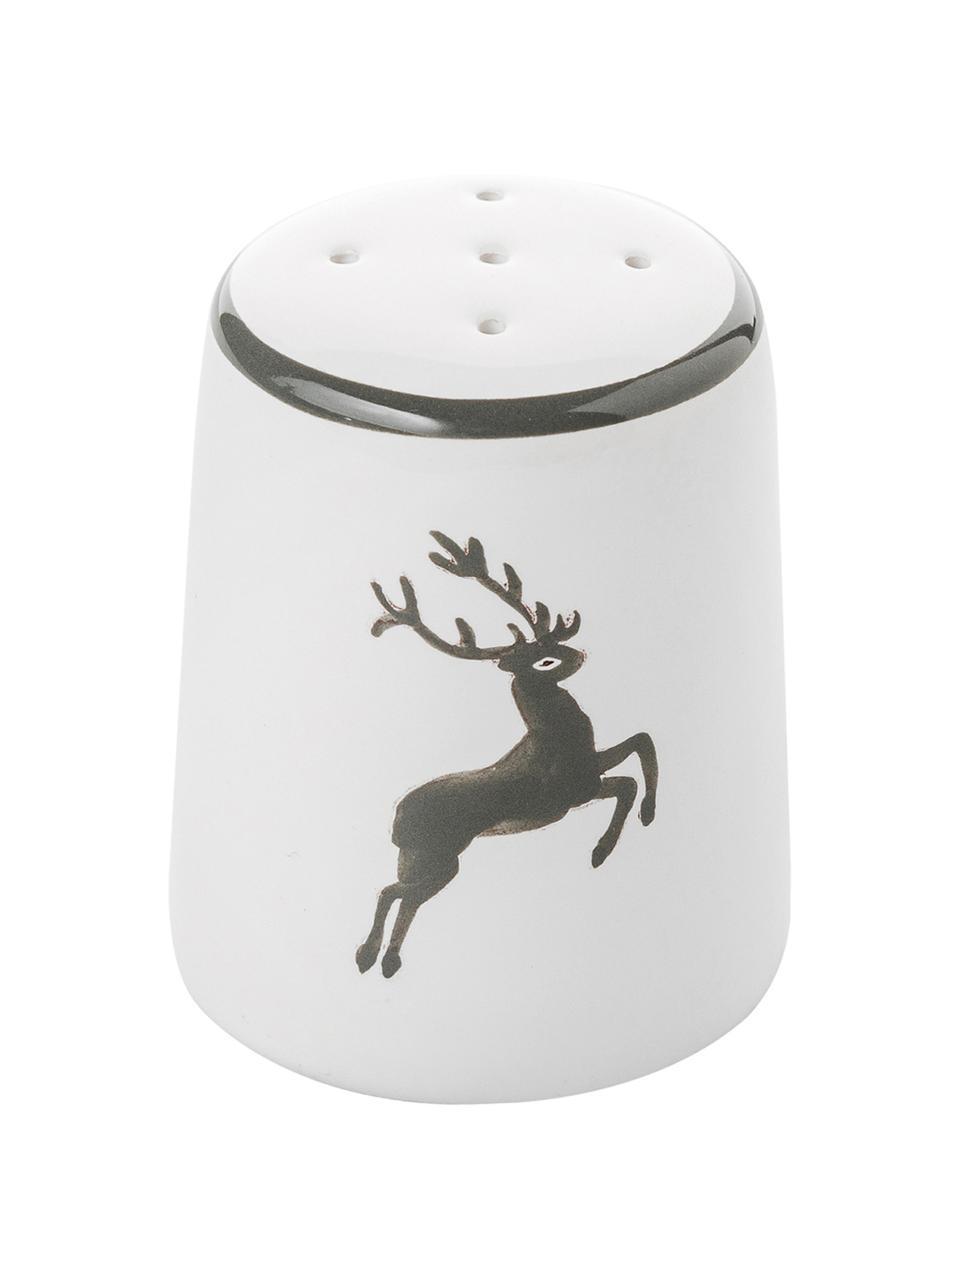 Handbemalter Salzstreuer Classic Grauer Hirsch, Keramik, Grau,Weiß, H 4 cm